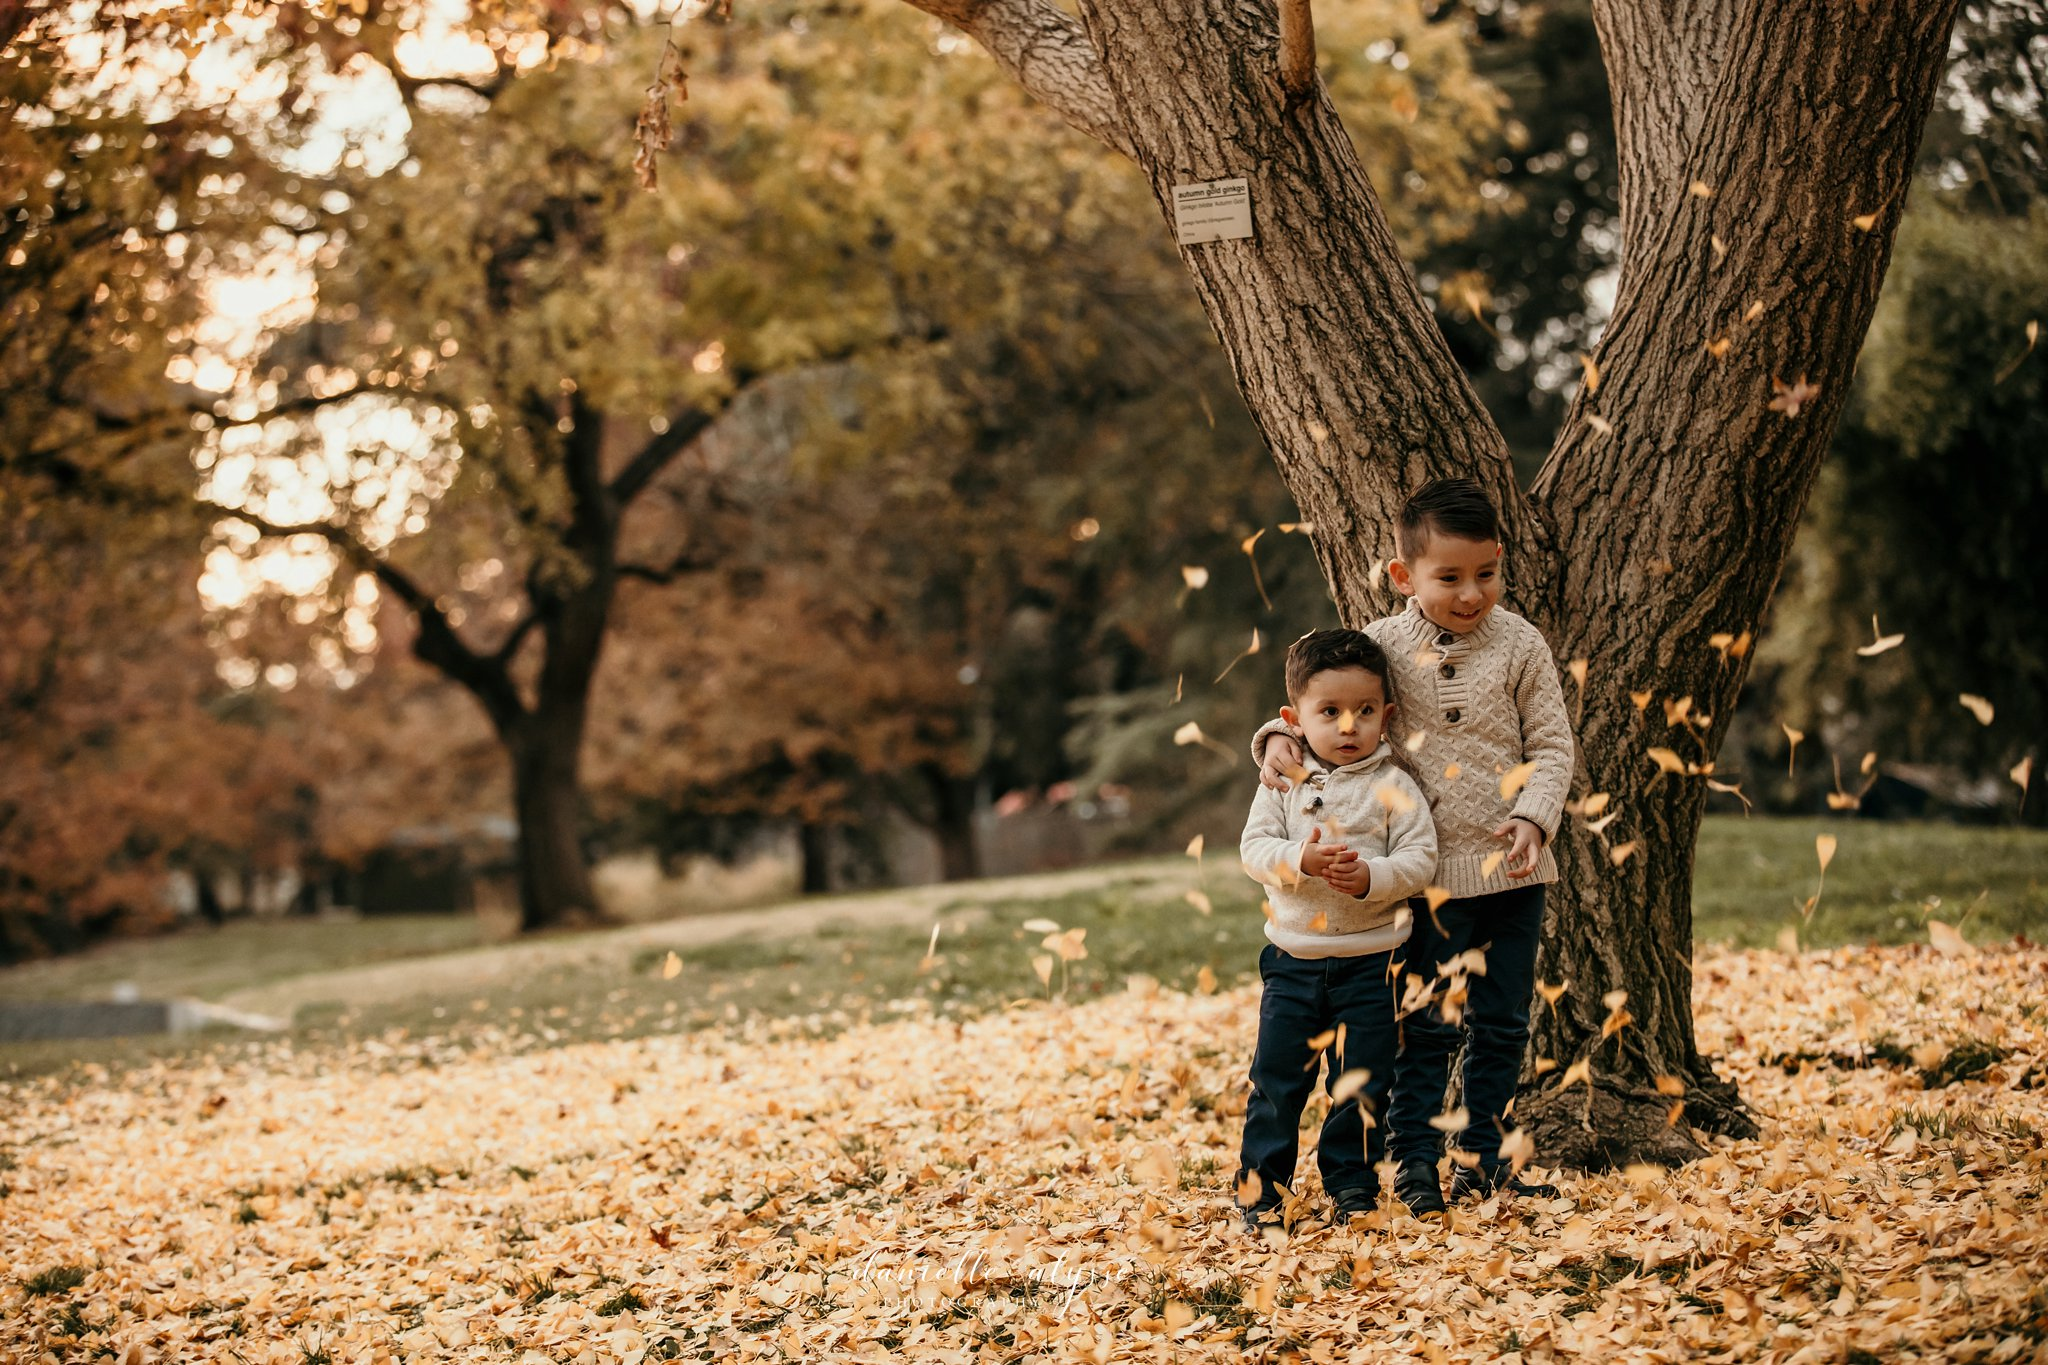 181205_family_portrait_fall_davis_arboretum_andrea_danielle_alysse_photography_40_WEB.jpg